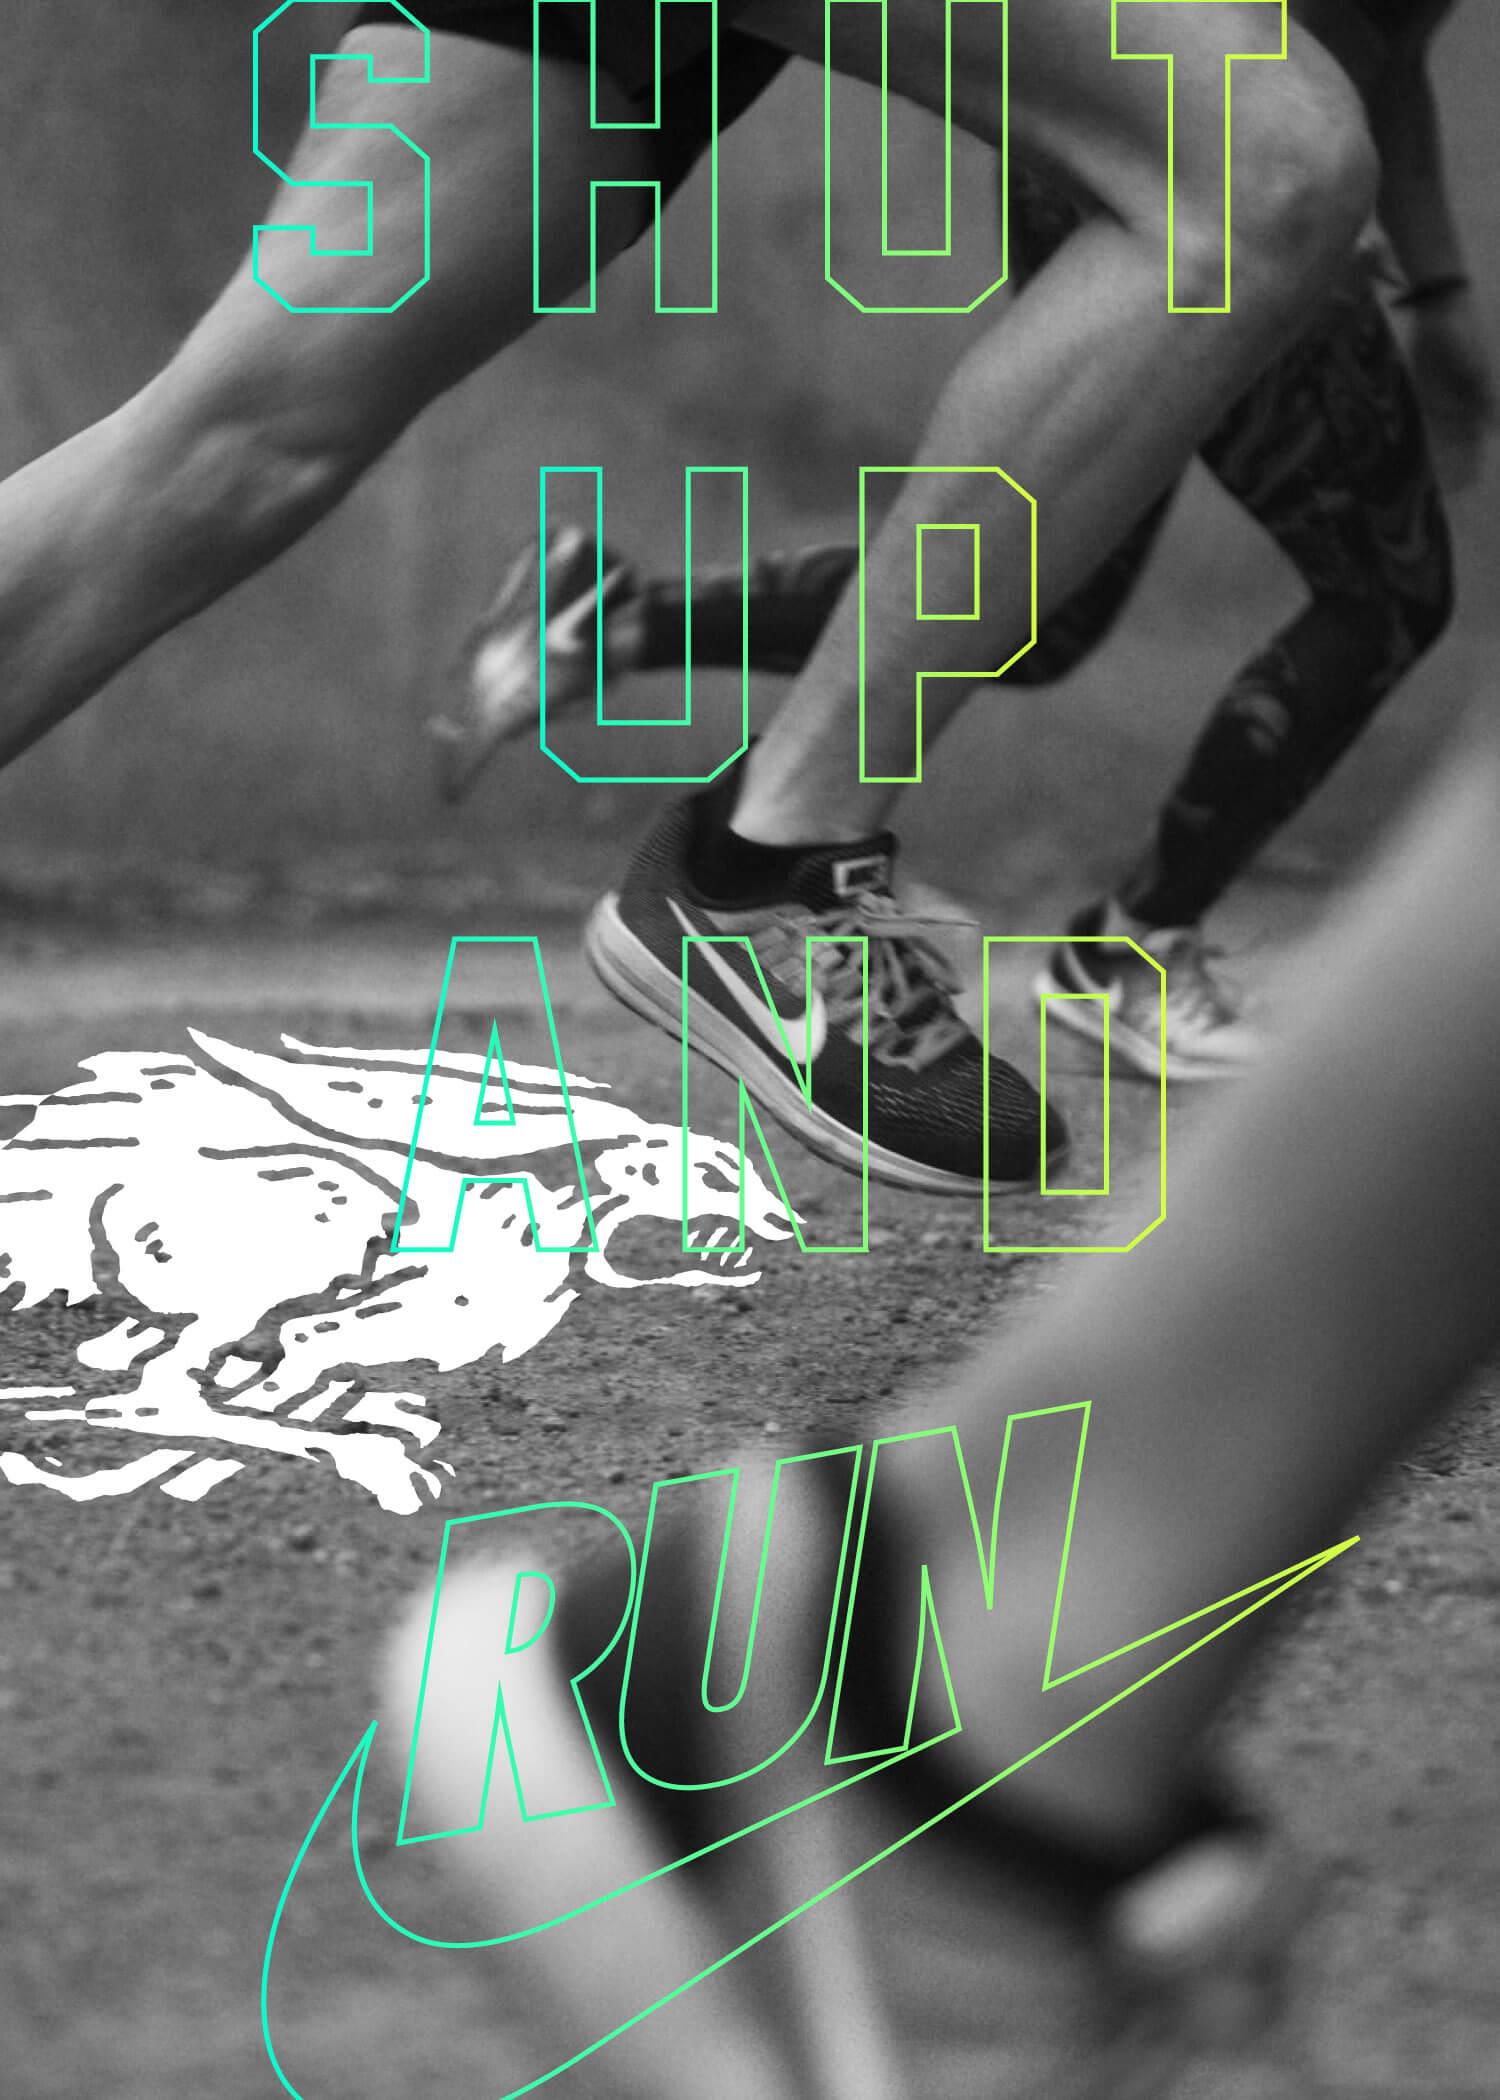 030717-JDI_running_posters_3